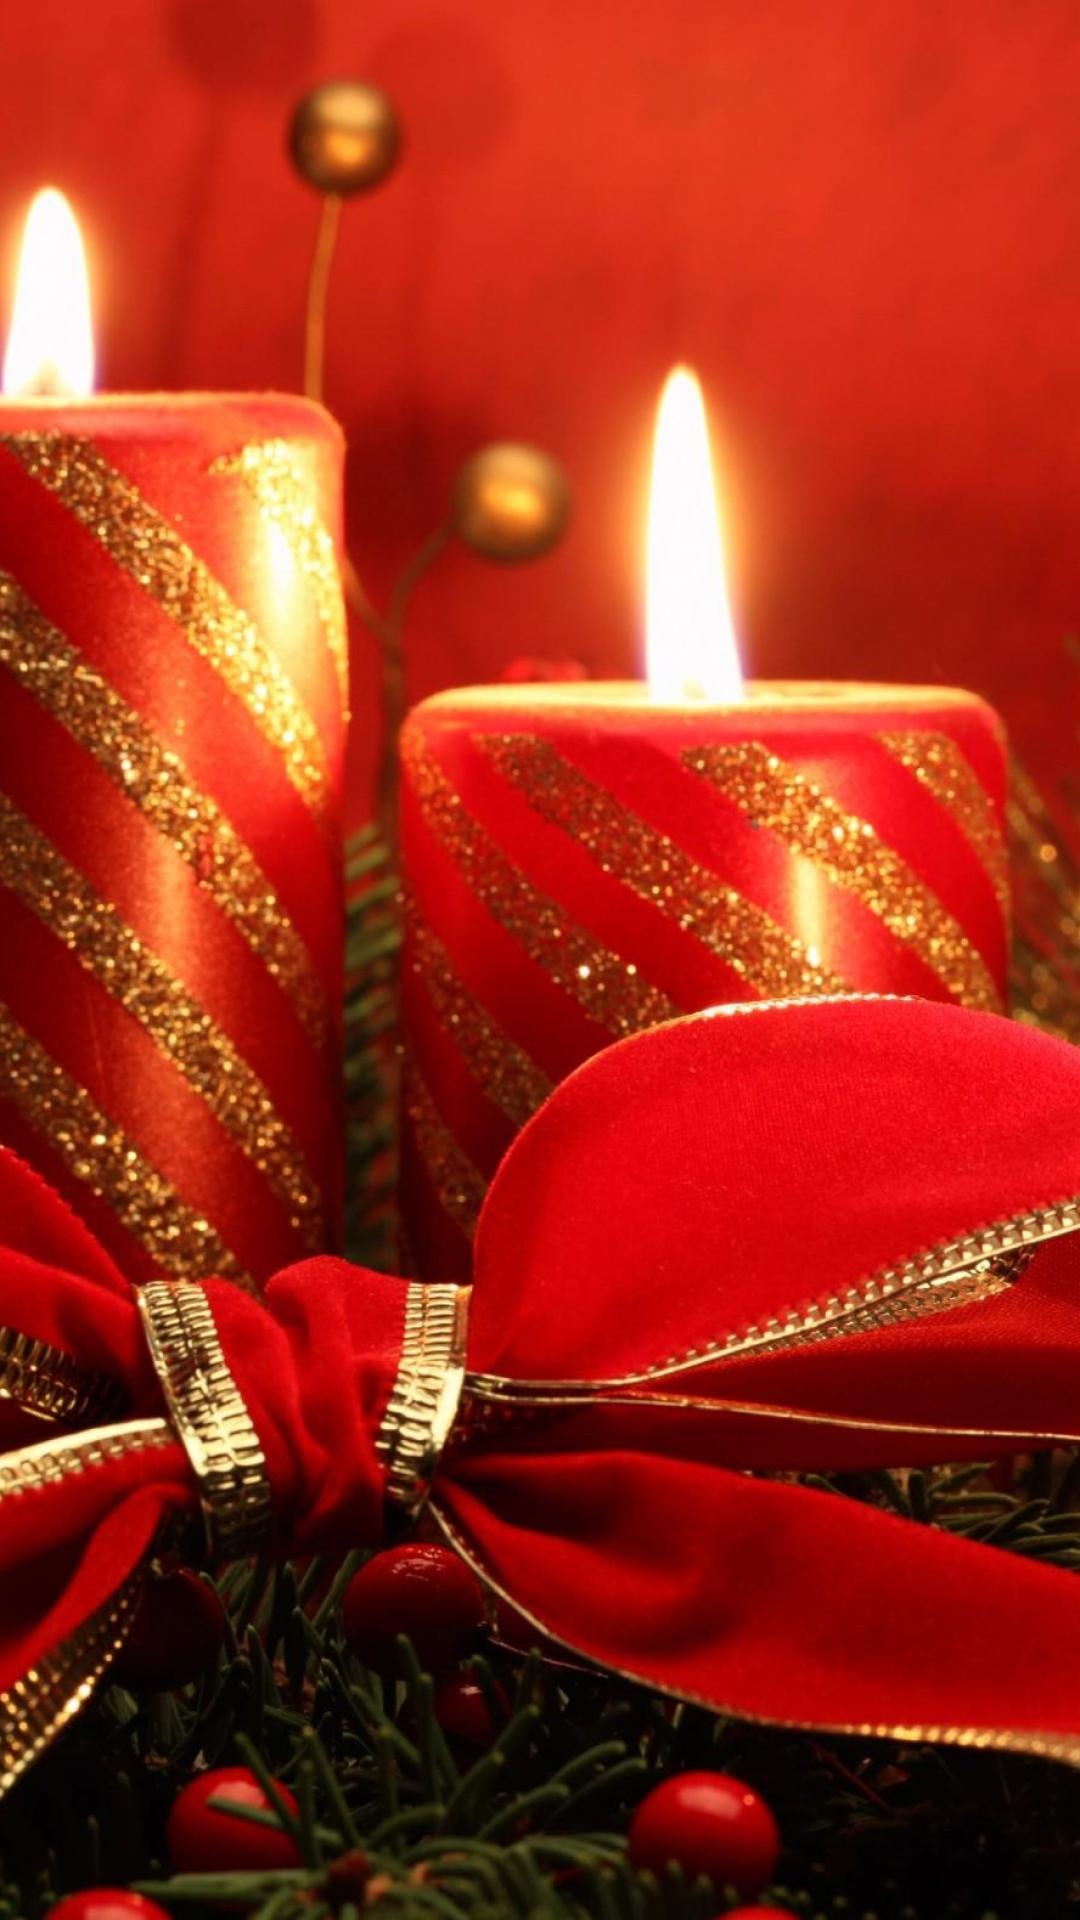 Christmas holiday candles